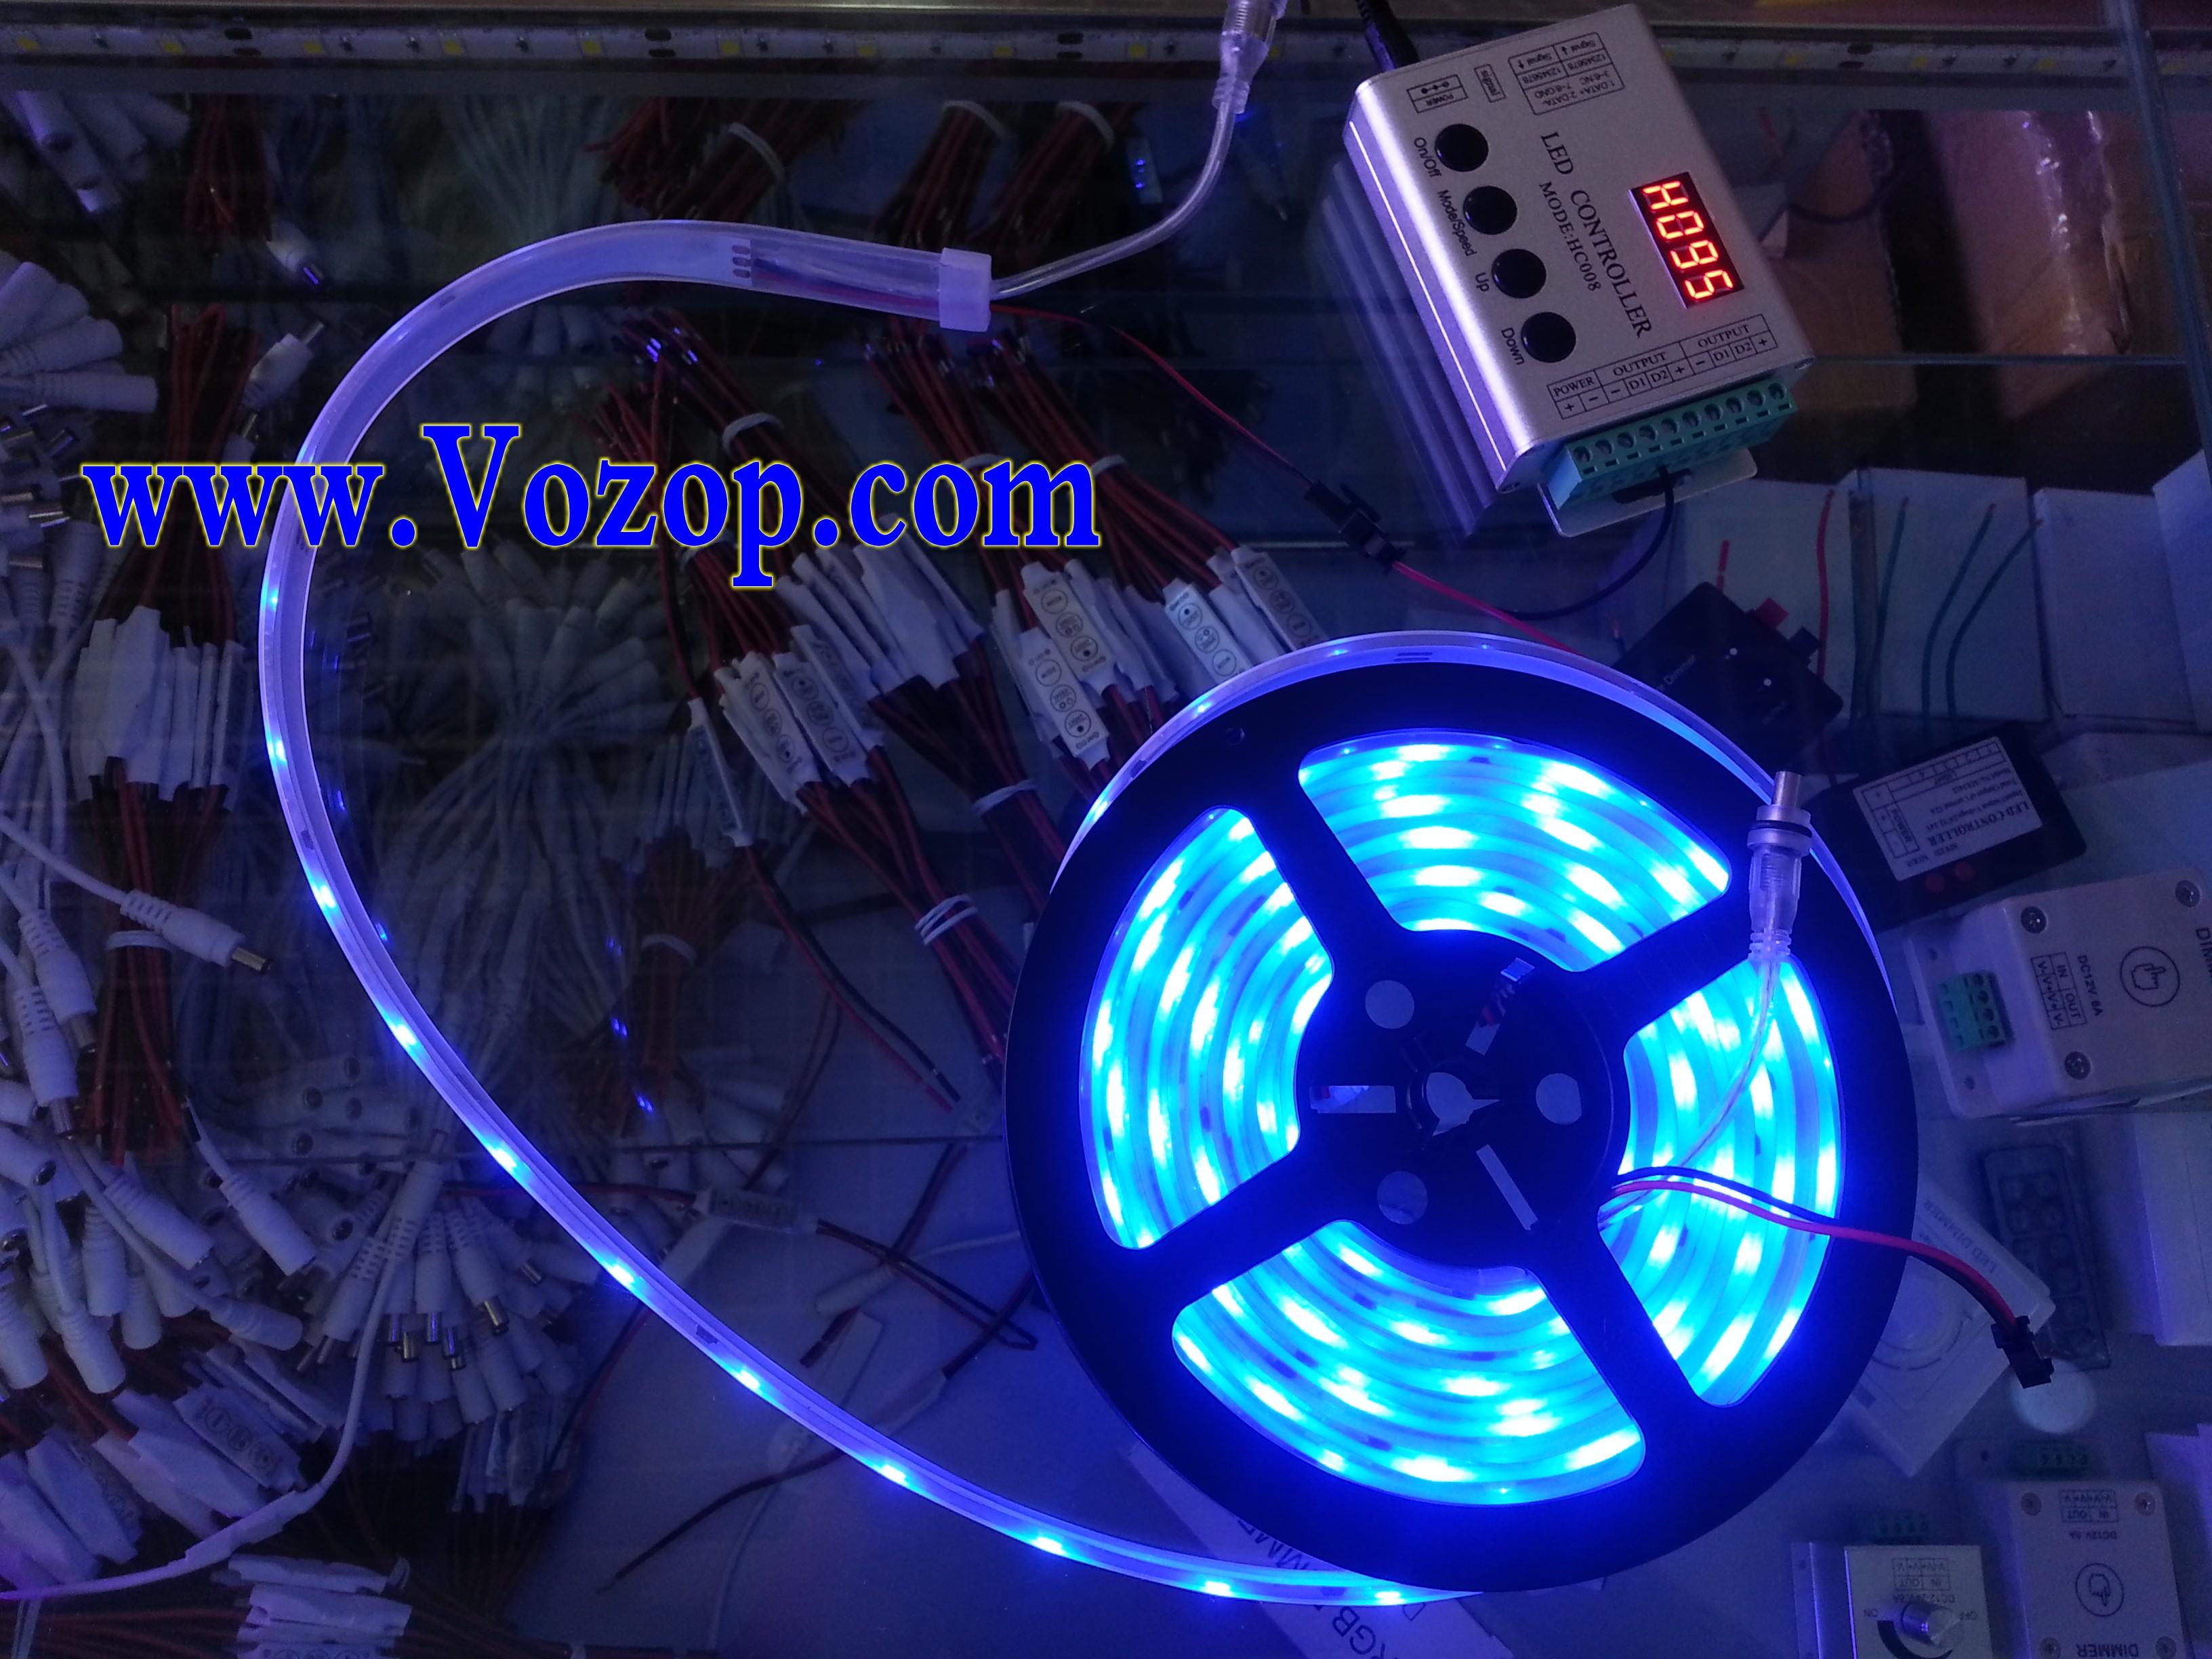 5M_Intelligent_TM1812_RGB_5050_Digital_LED_Strip_with_Controller_blue